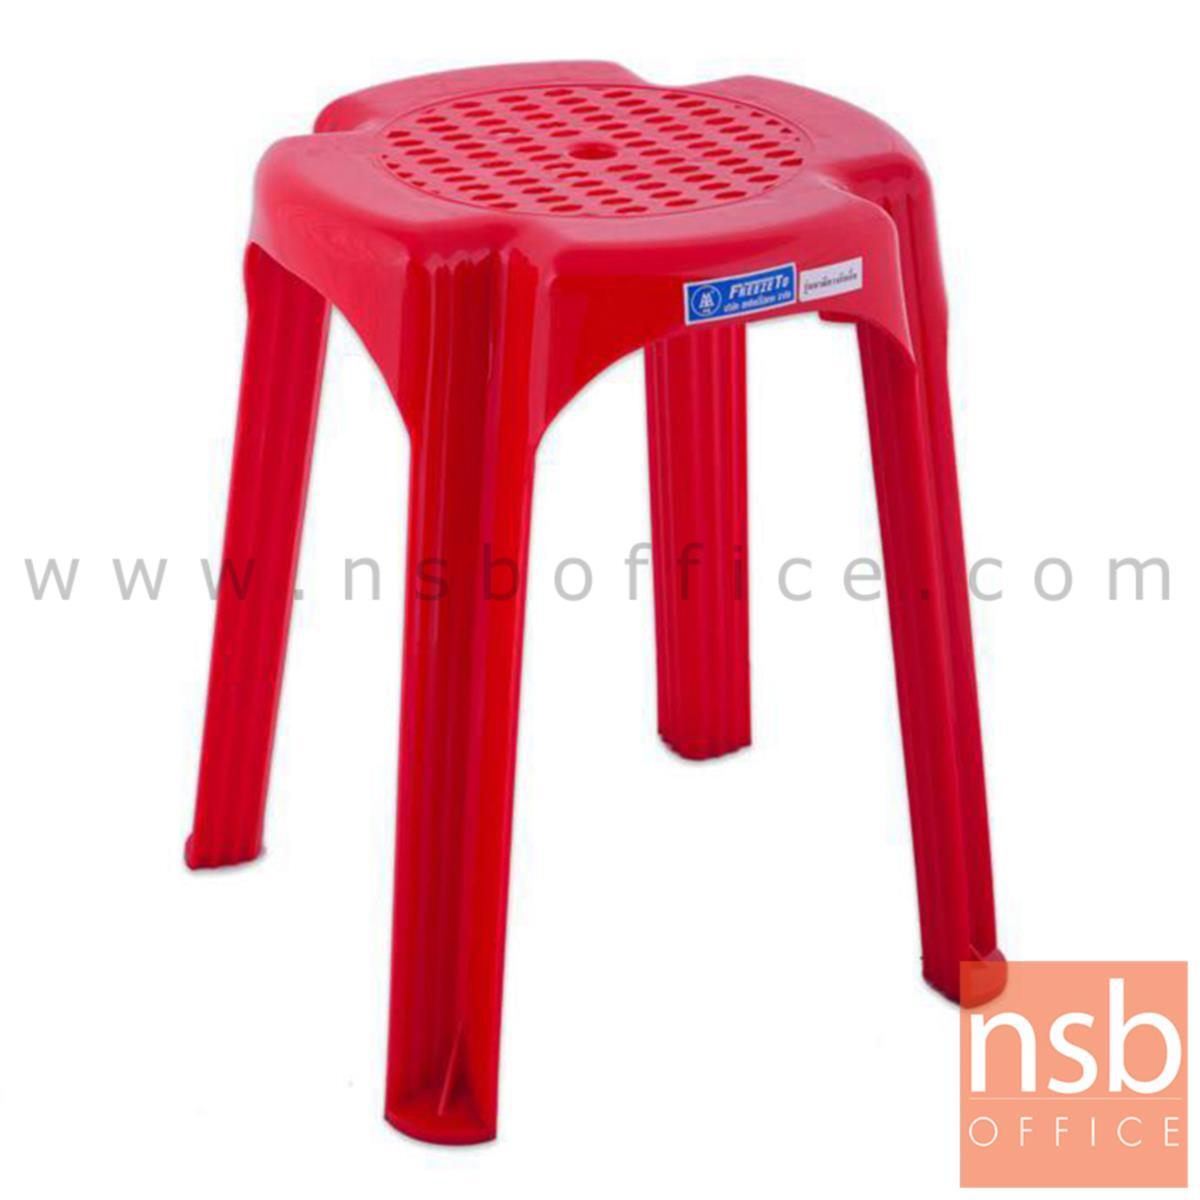 B10A063:เก้าอี้พลาสติก รุ่น DISMON_CHAIR ซ้อนทับได้ (ผลิตทั้งเกรด A และ B)